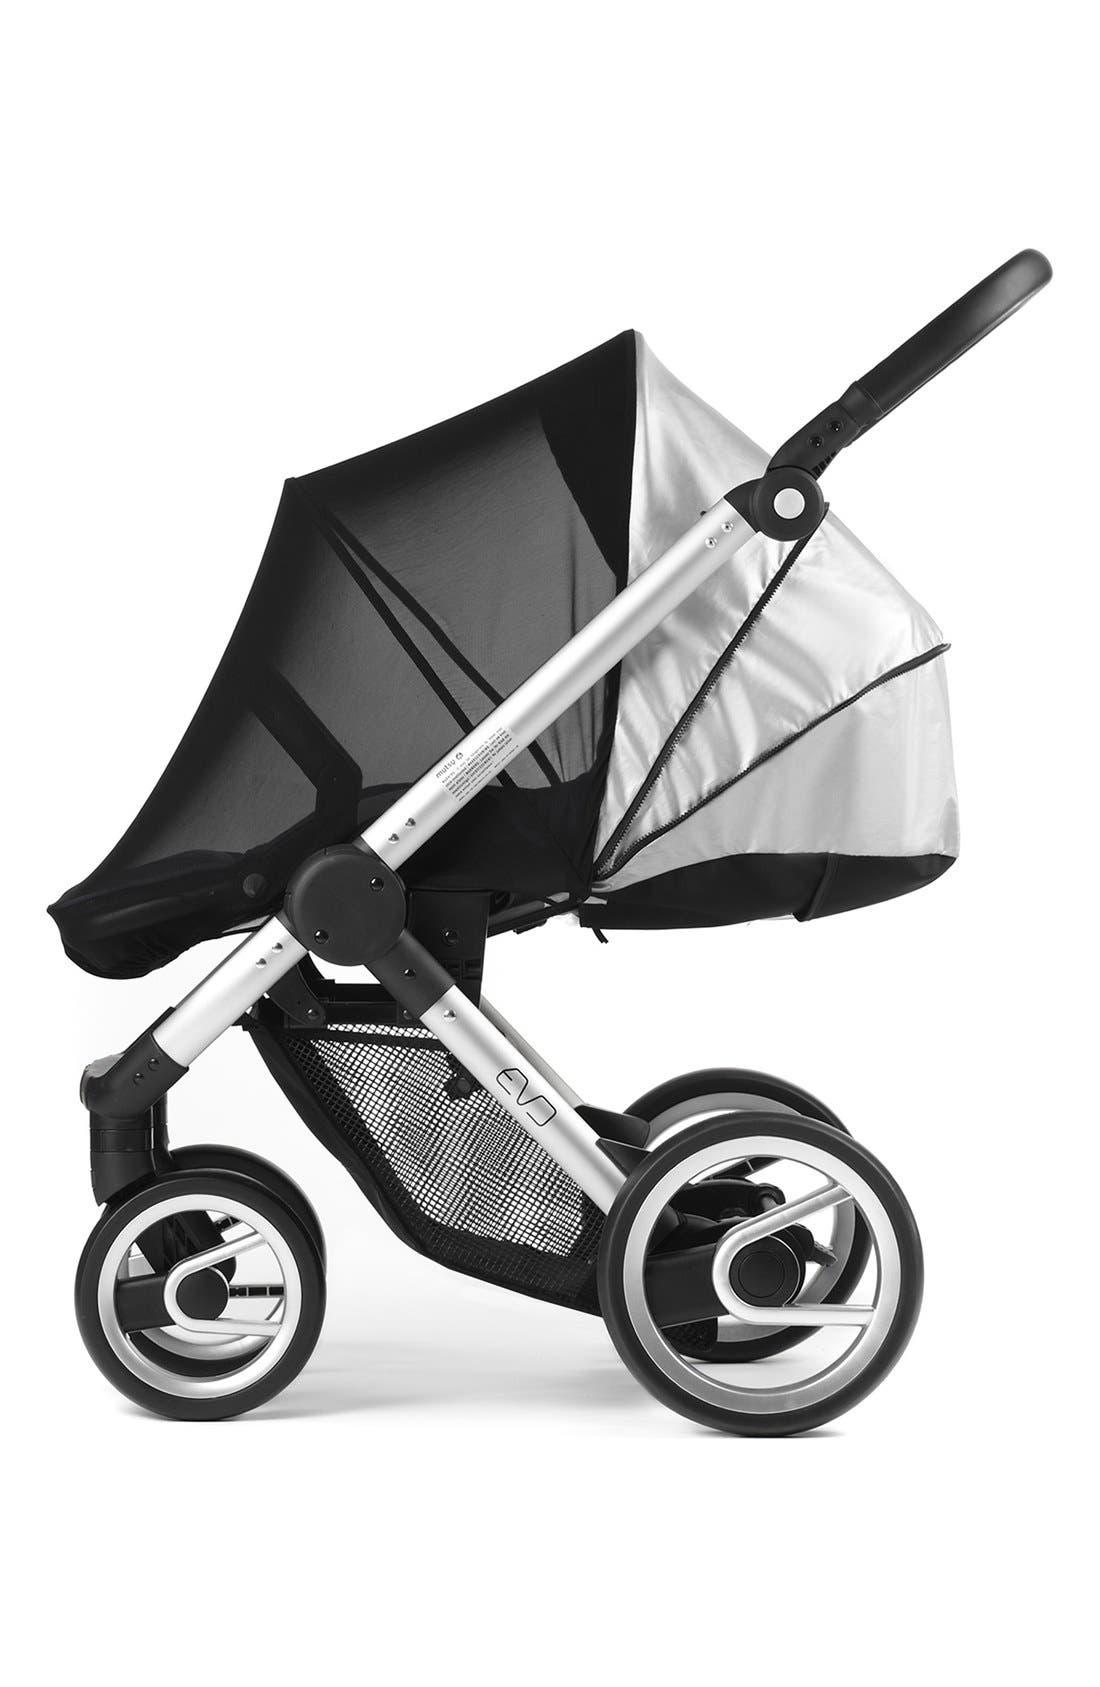 'Evo' Stroller Seat UV Cover,                         Main,                         color, 020